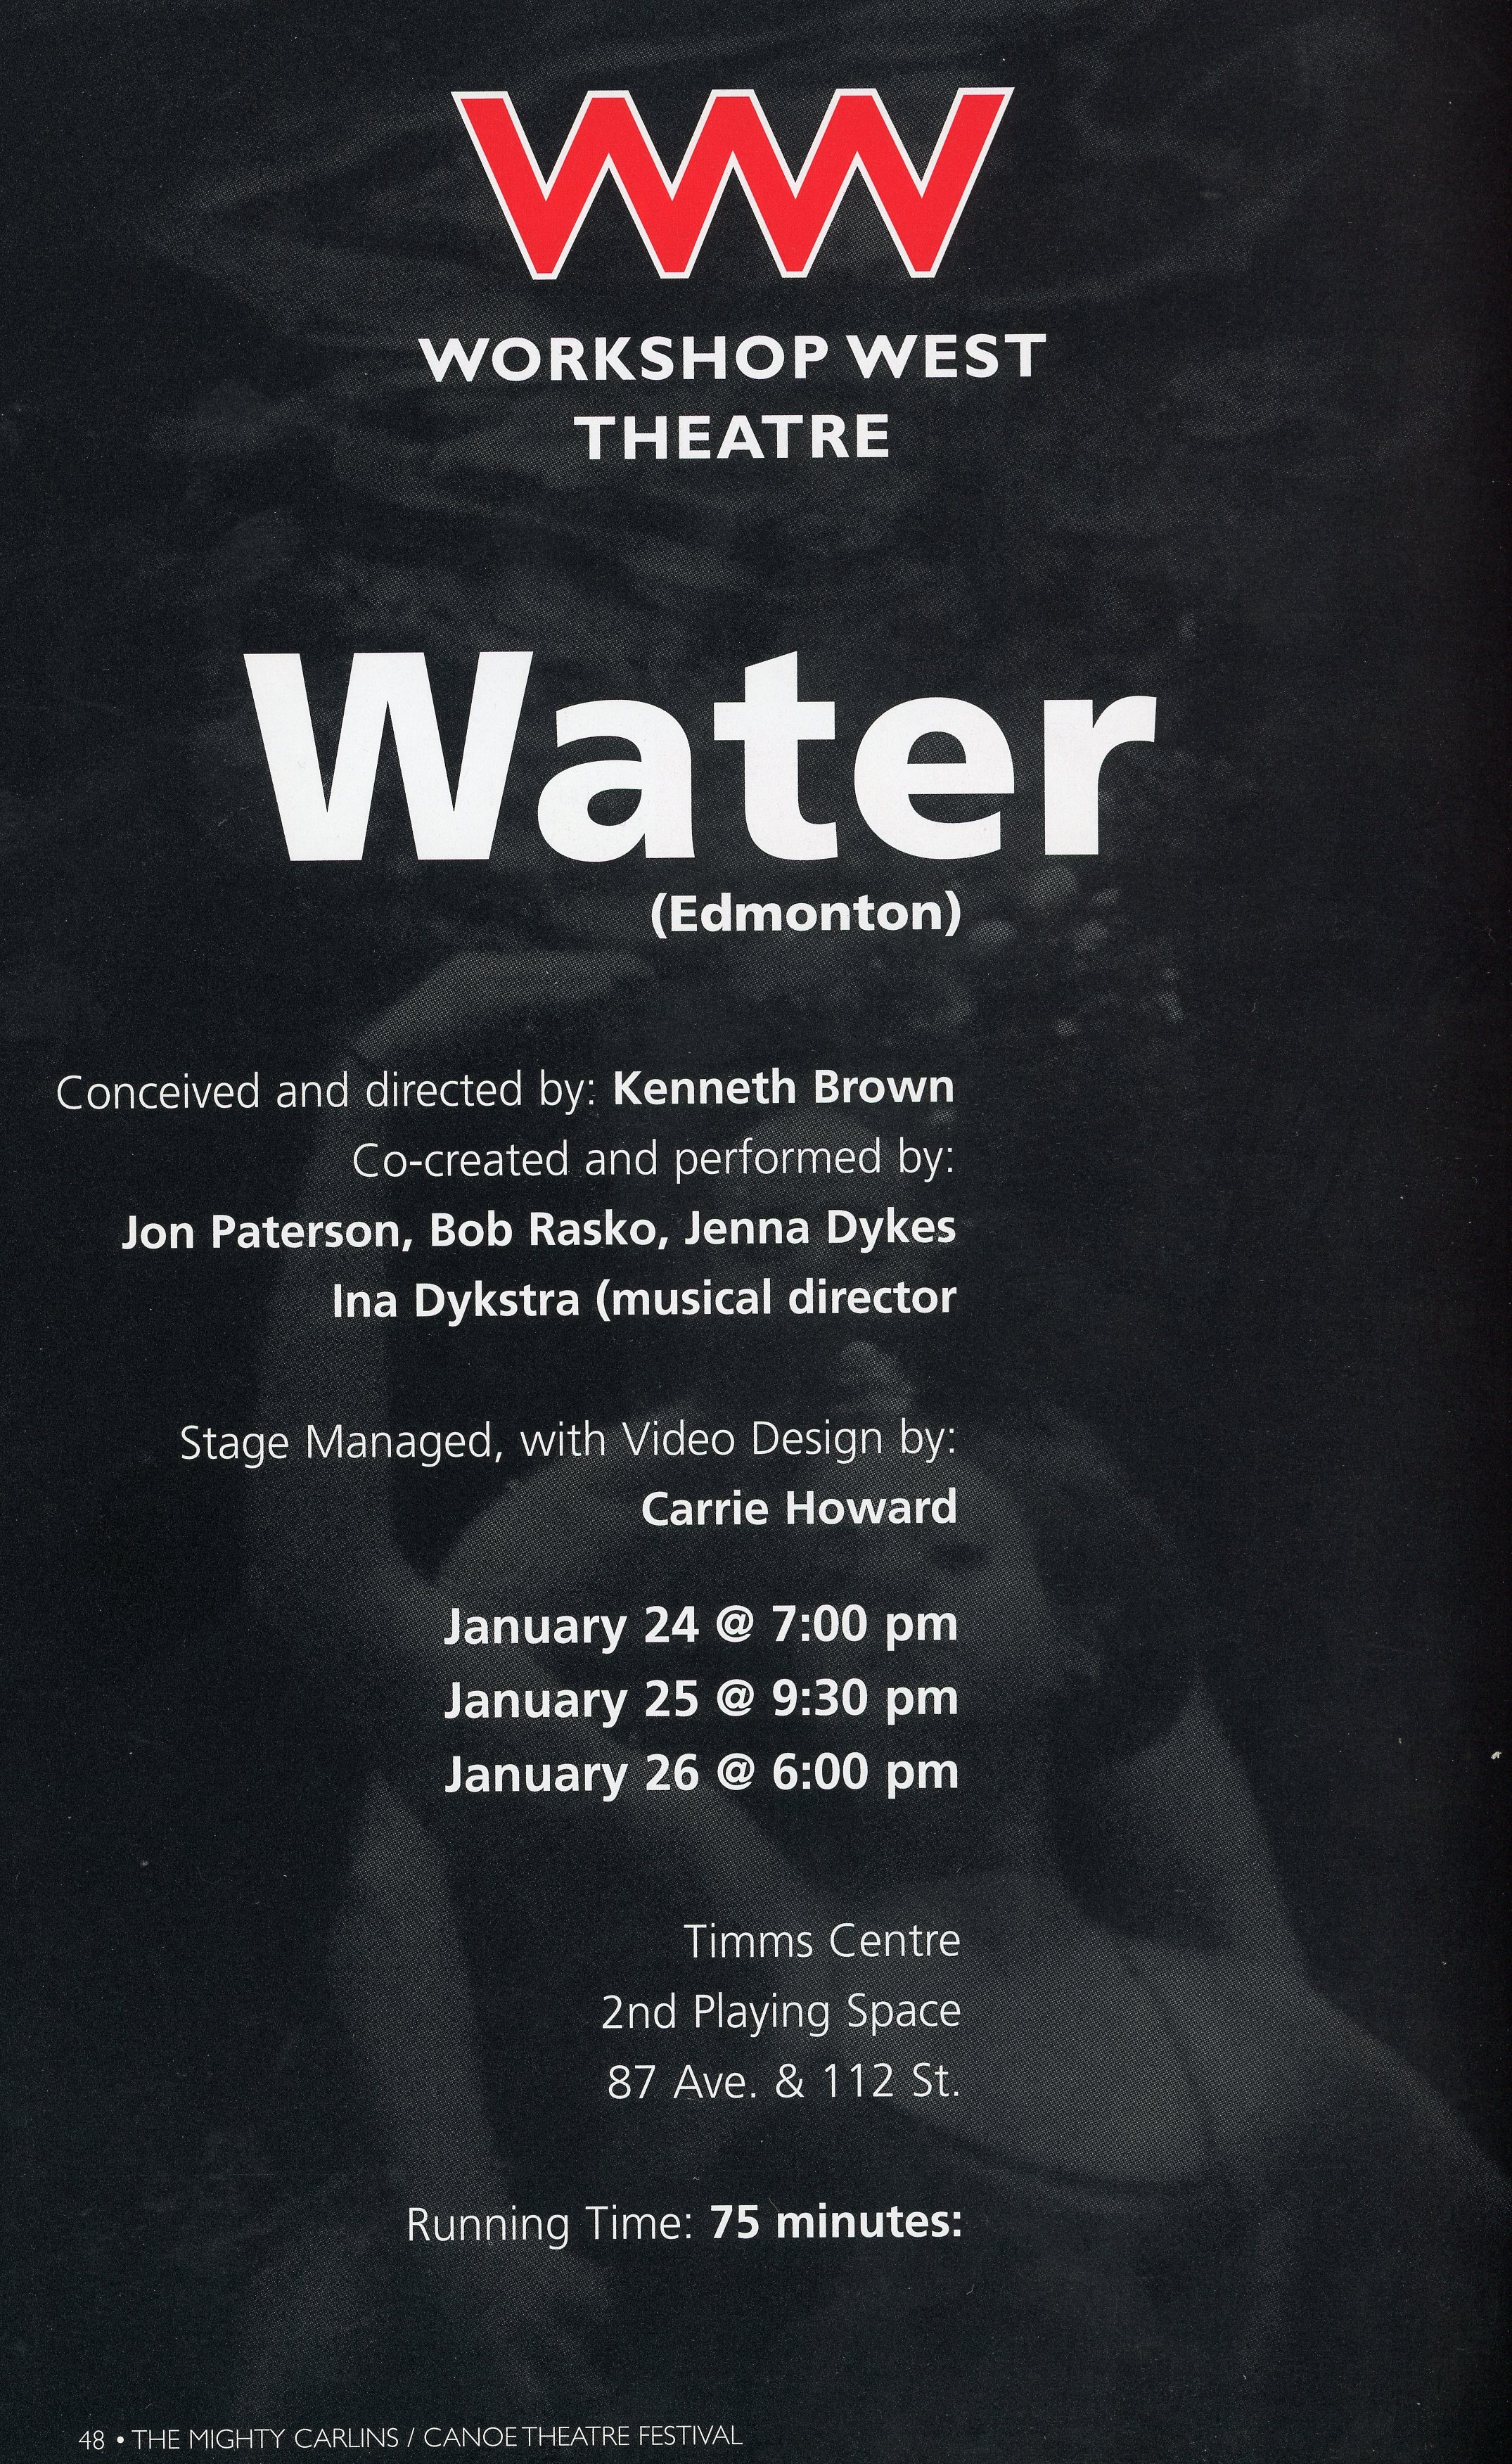 Workshop West Theatre (2008)-Production Information-Water_JPEG.jpg